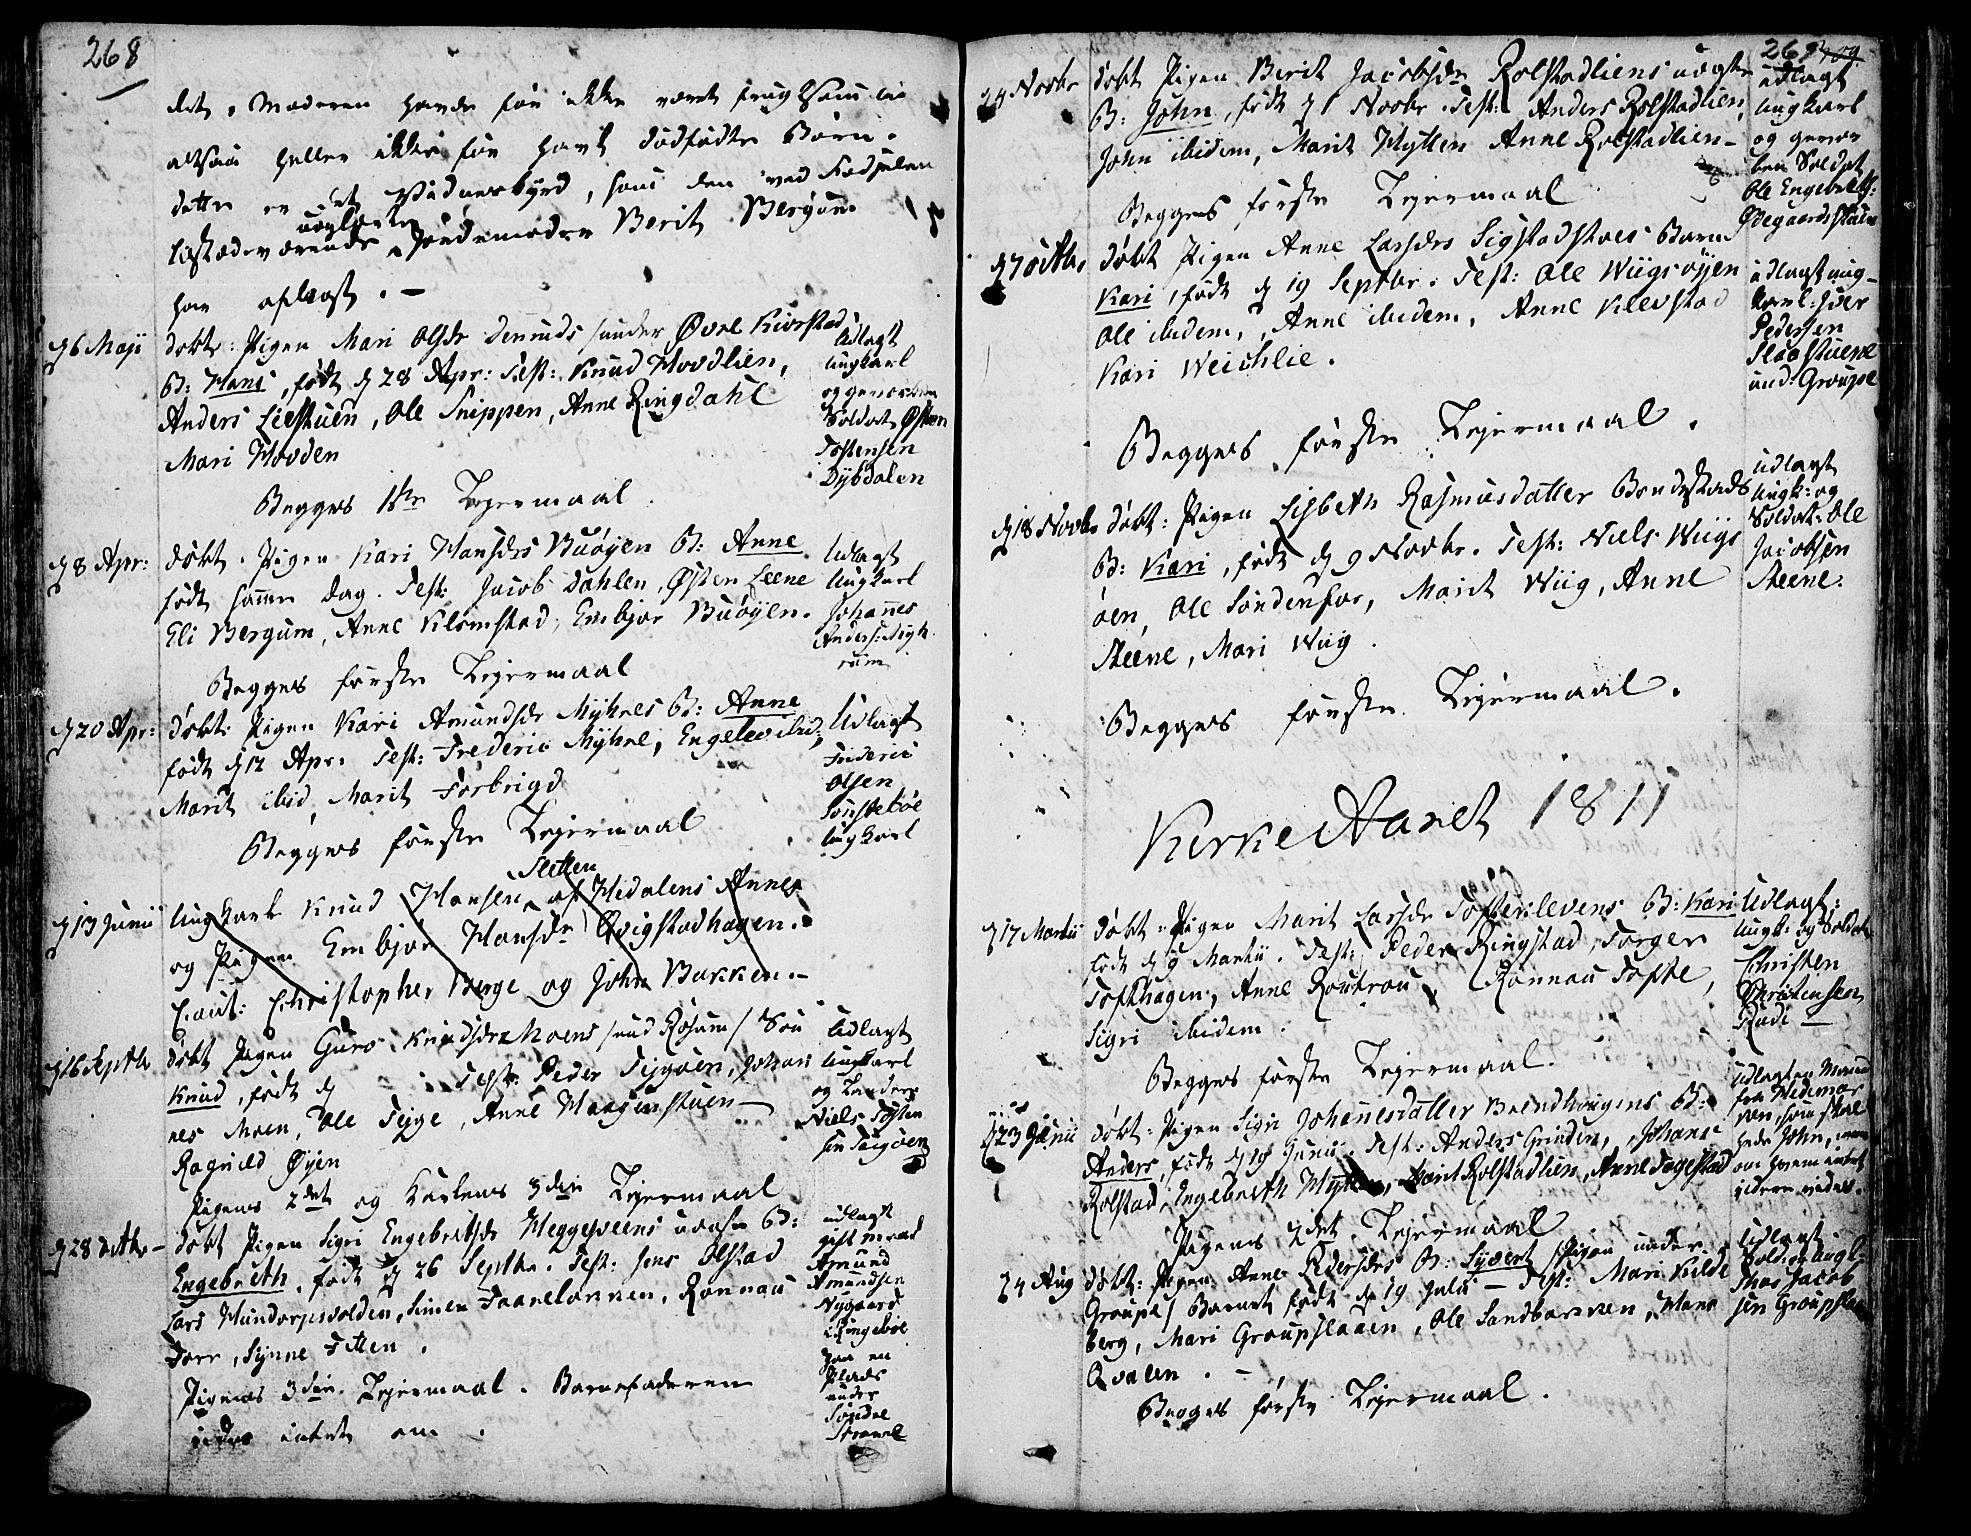 SAH, Fron prestekontor, H/Ha/Haa/L0001: Ministerialbok nr. 1, 1799-1816, s. 268-269